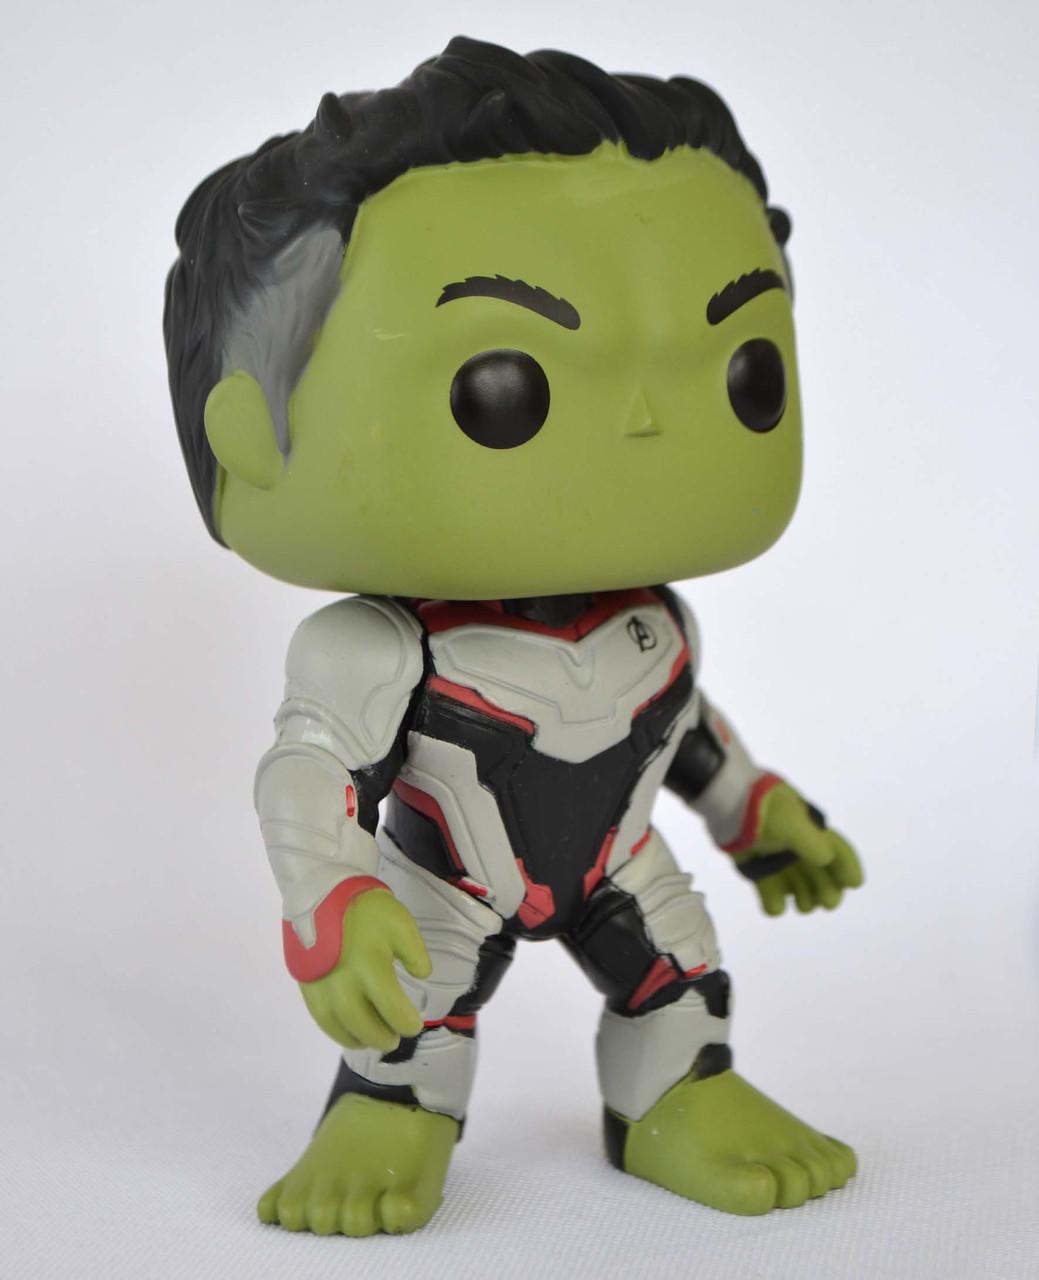 Коллекционная фигурка Funko Pop! Avengers Hulk